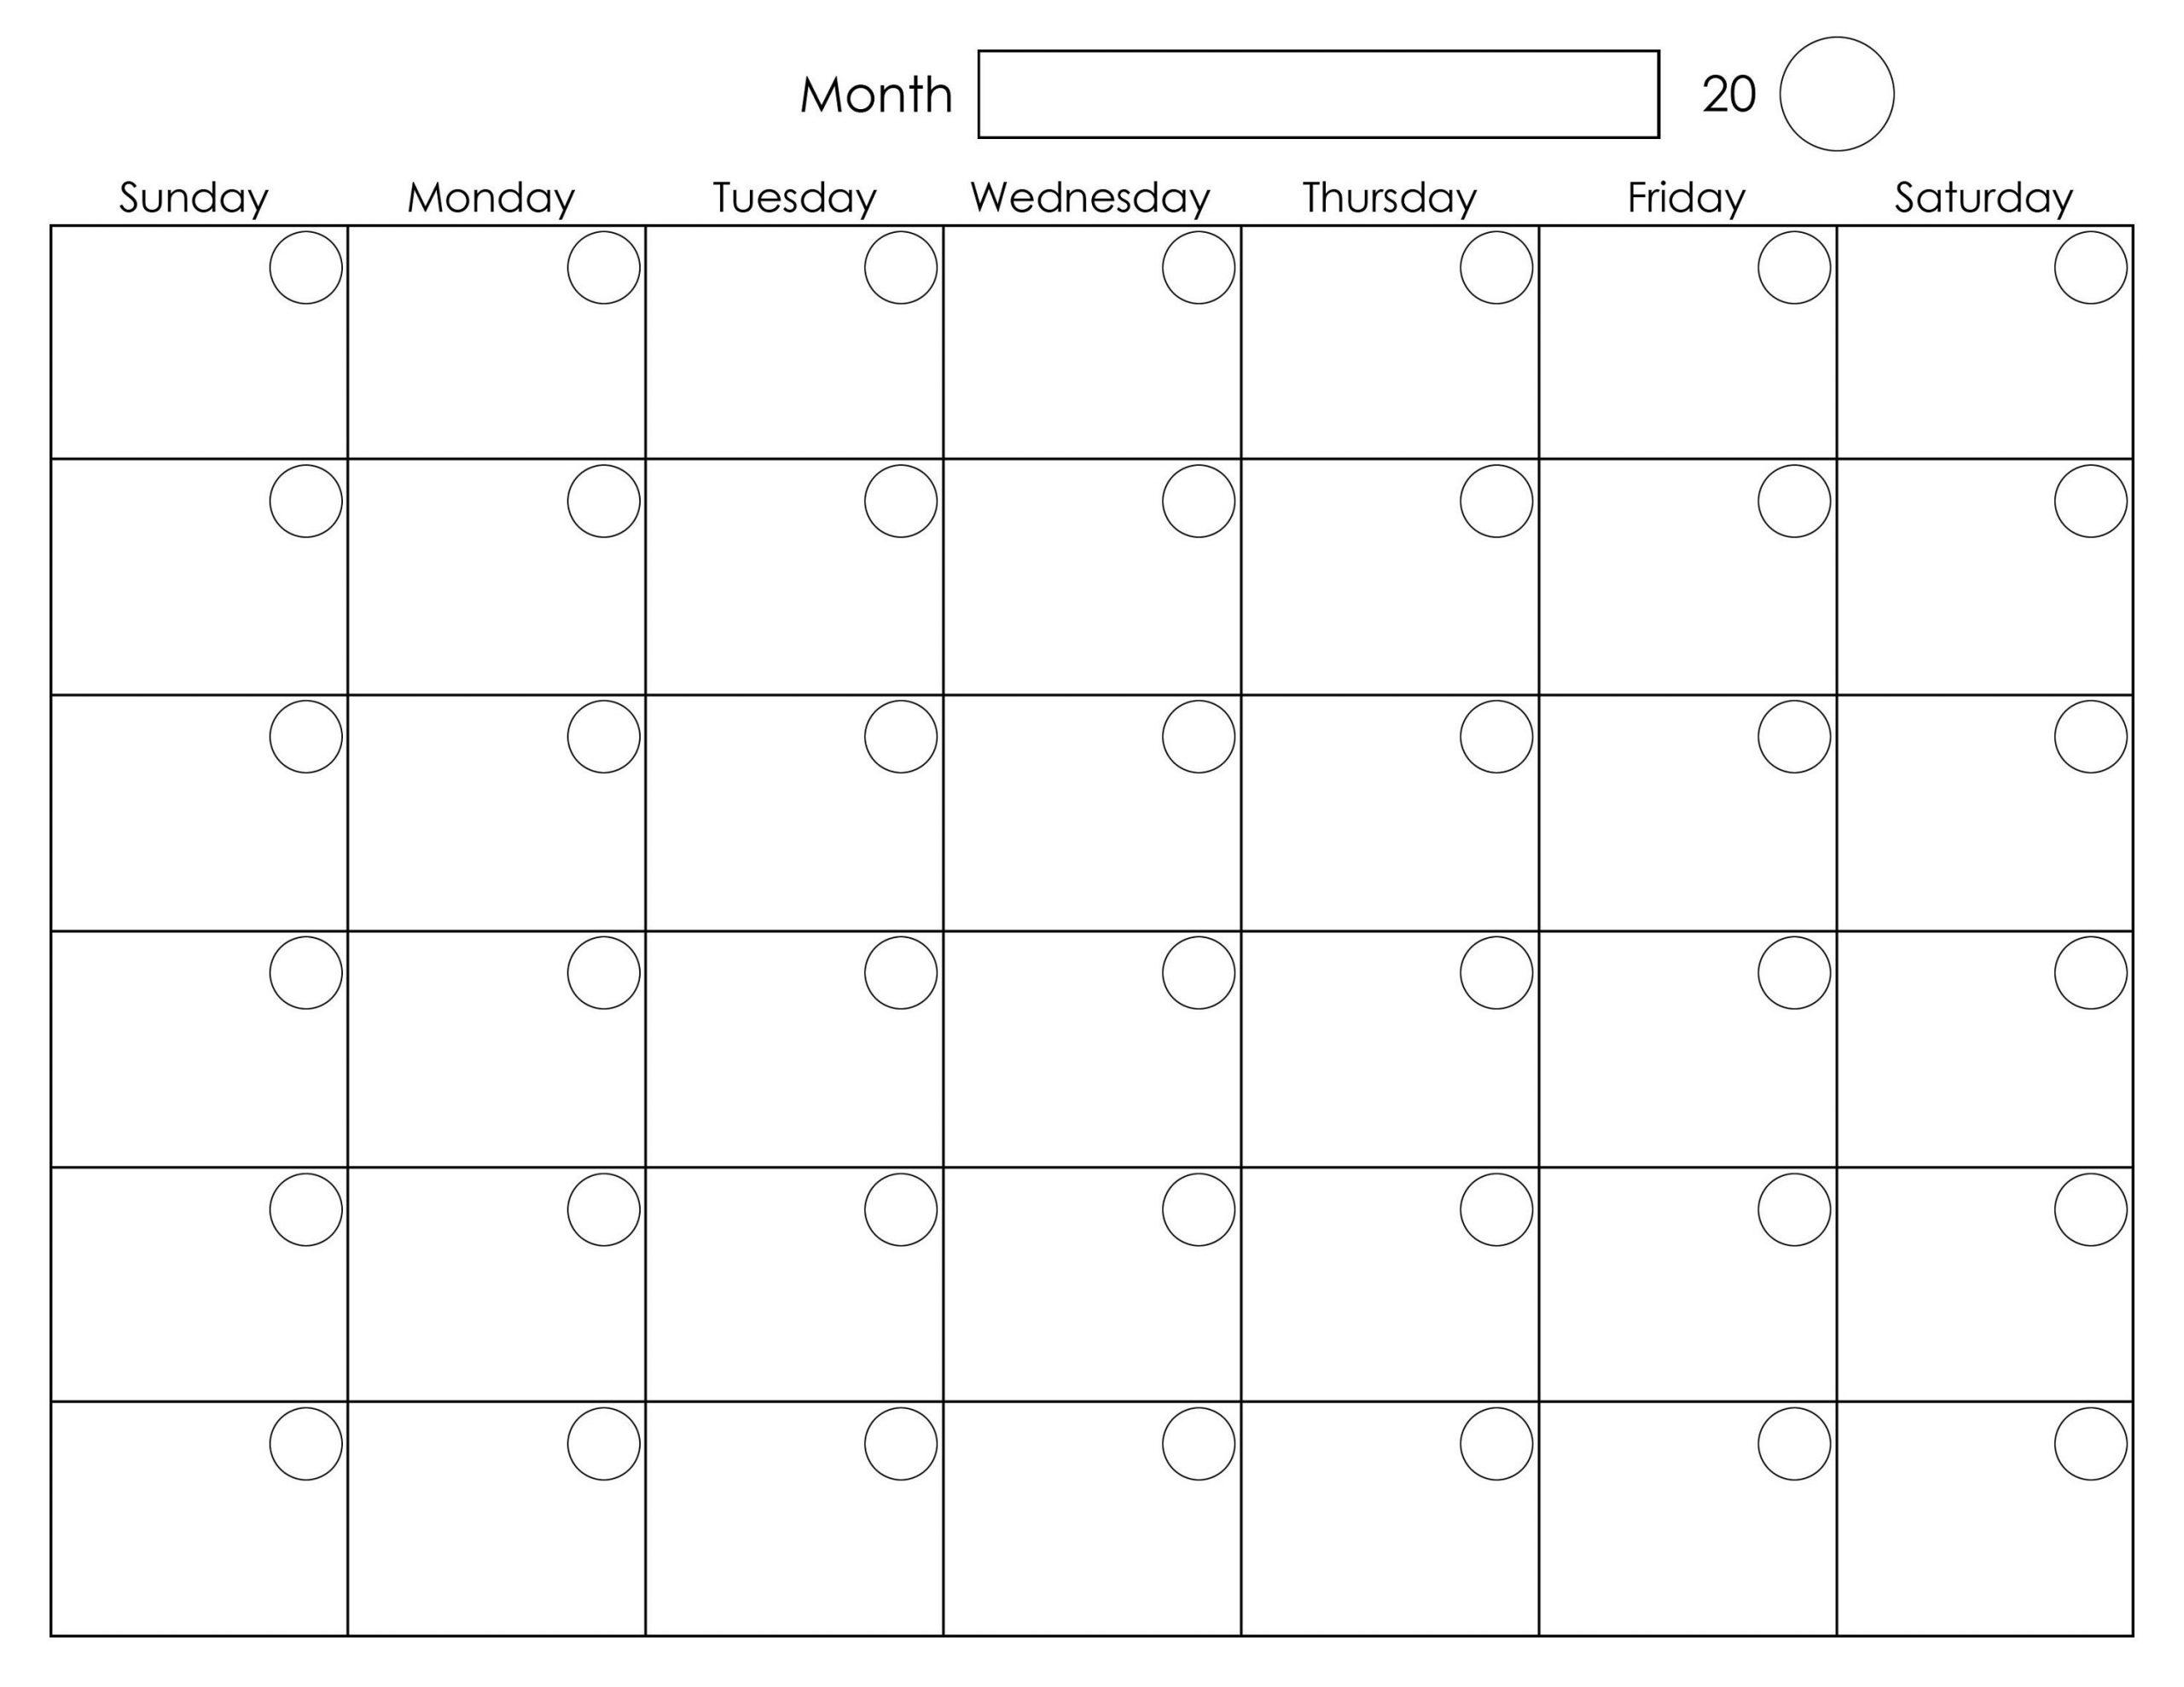 Get Free Blank Printable Monthly Calendar